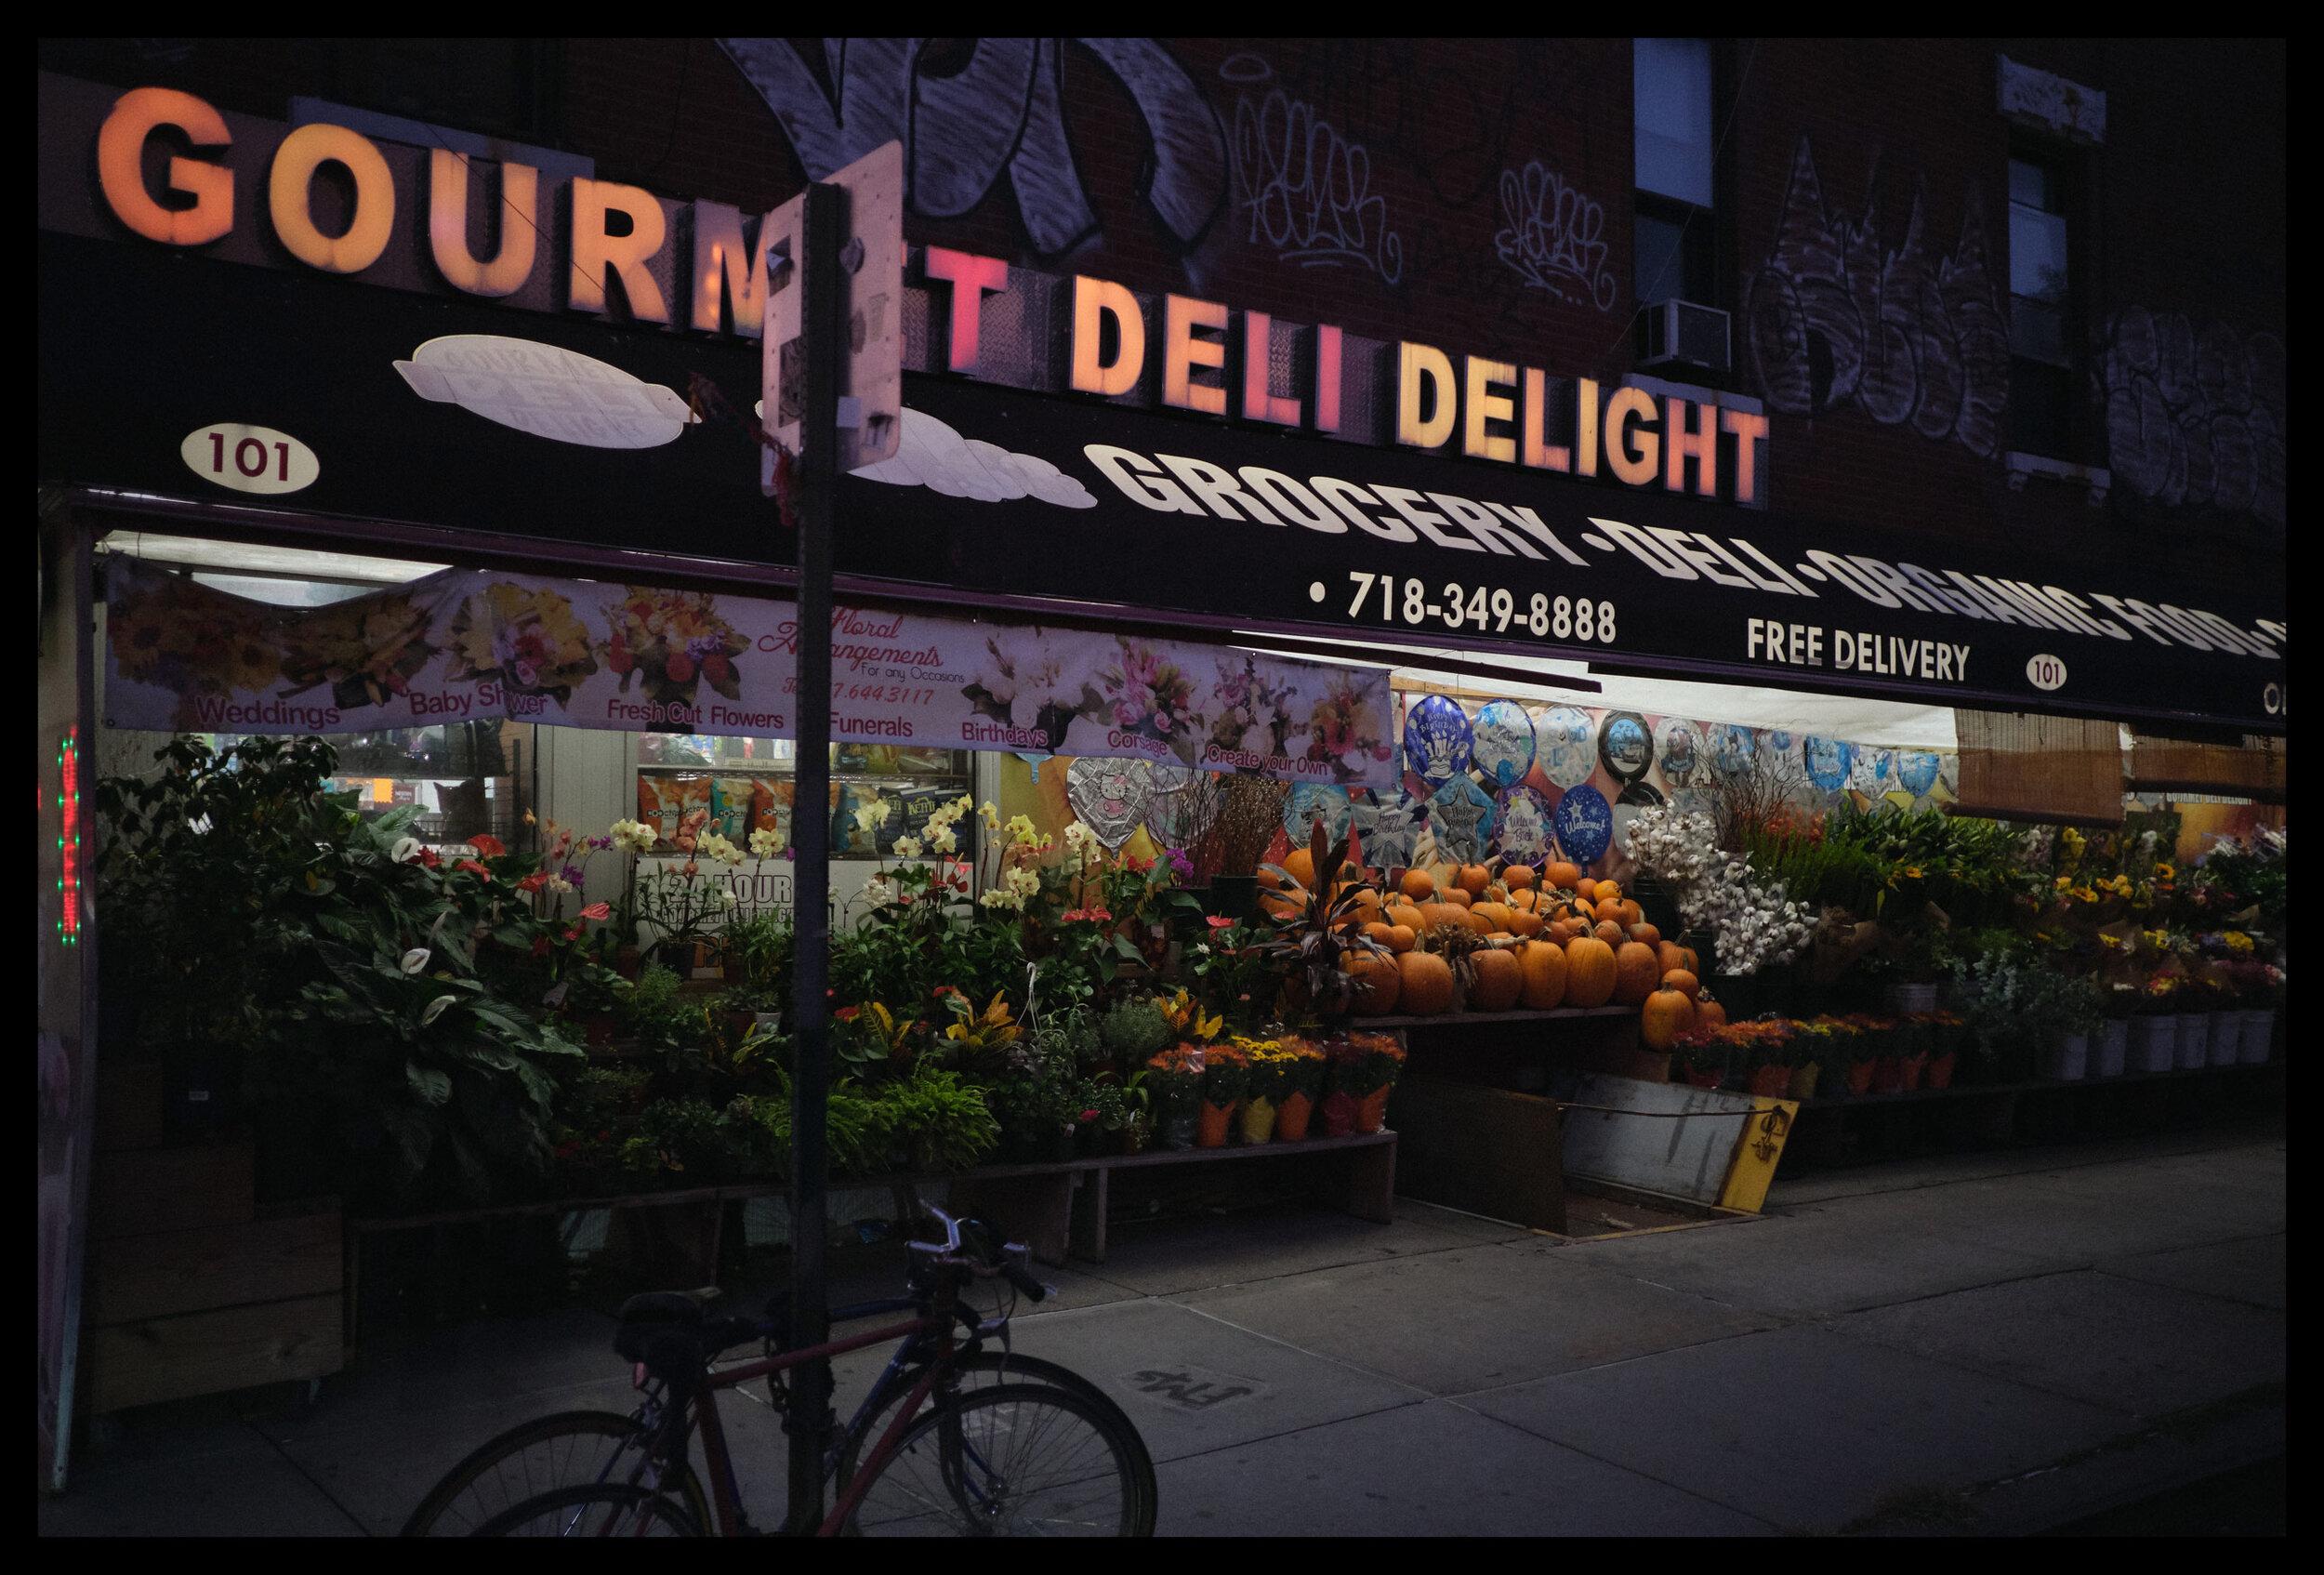 Gourmet Deli Delight